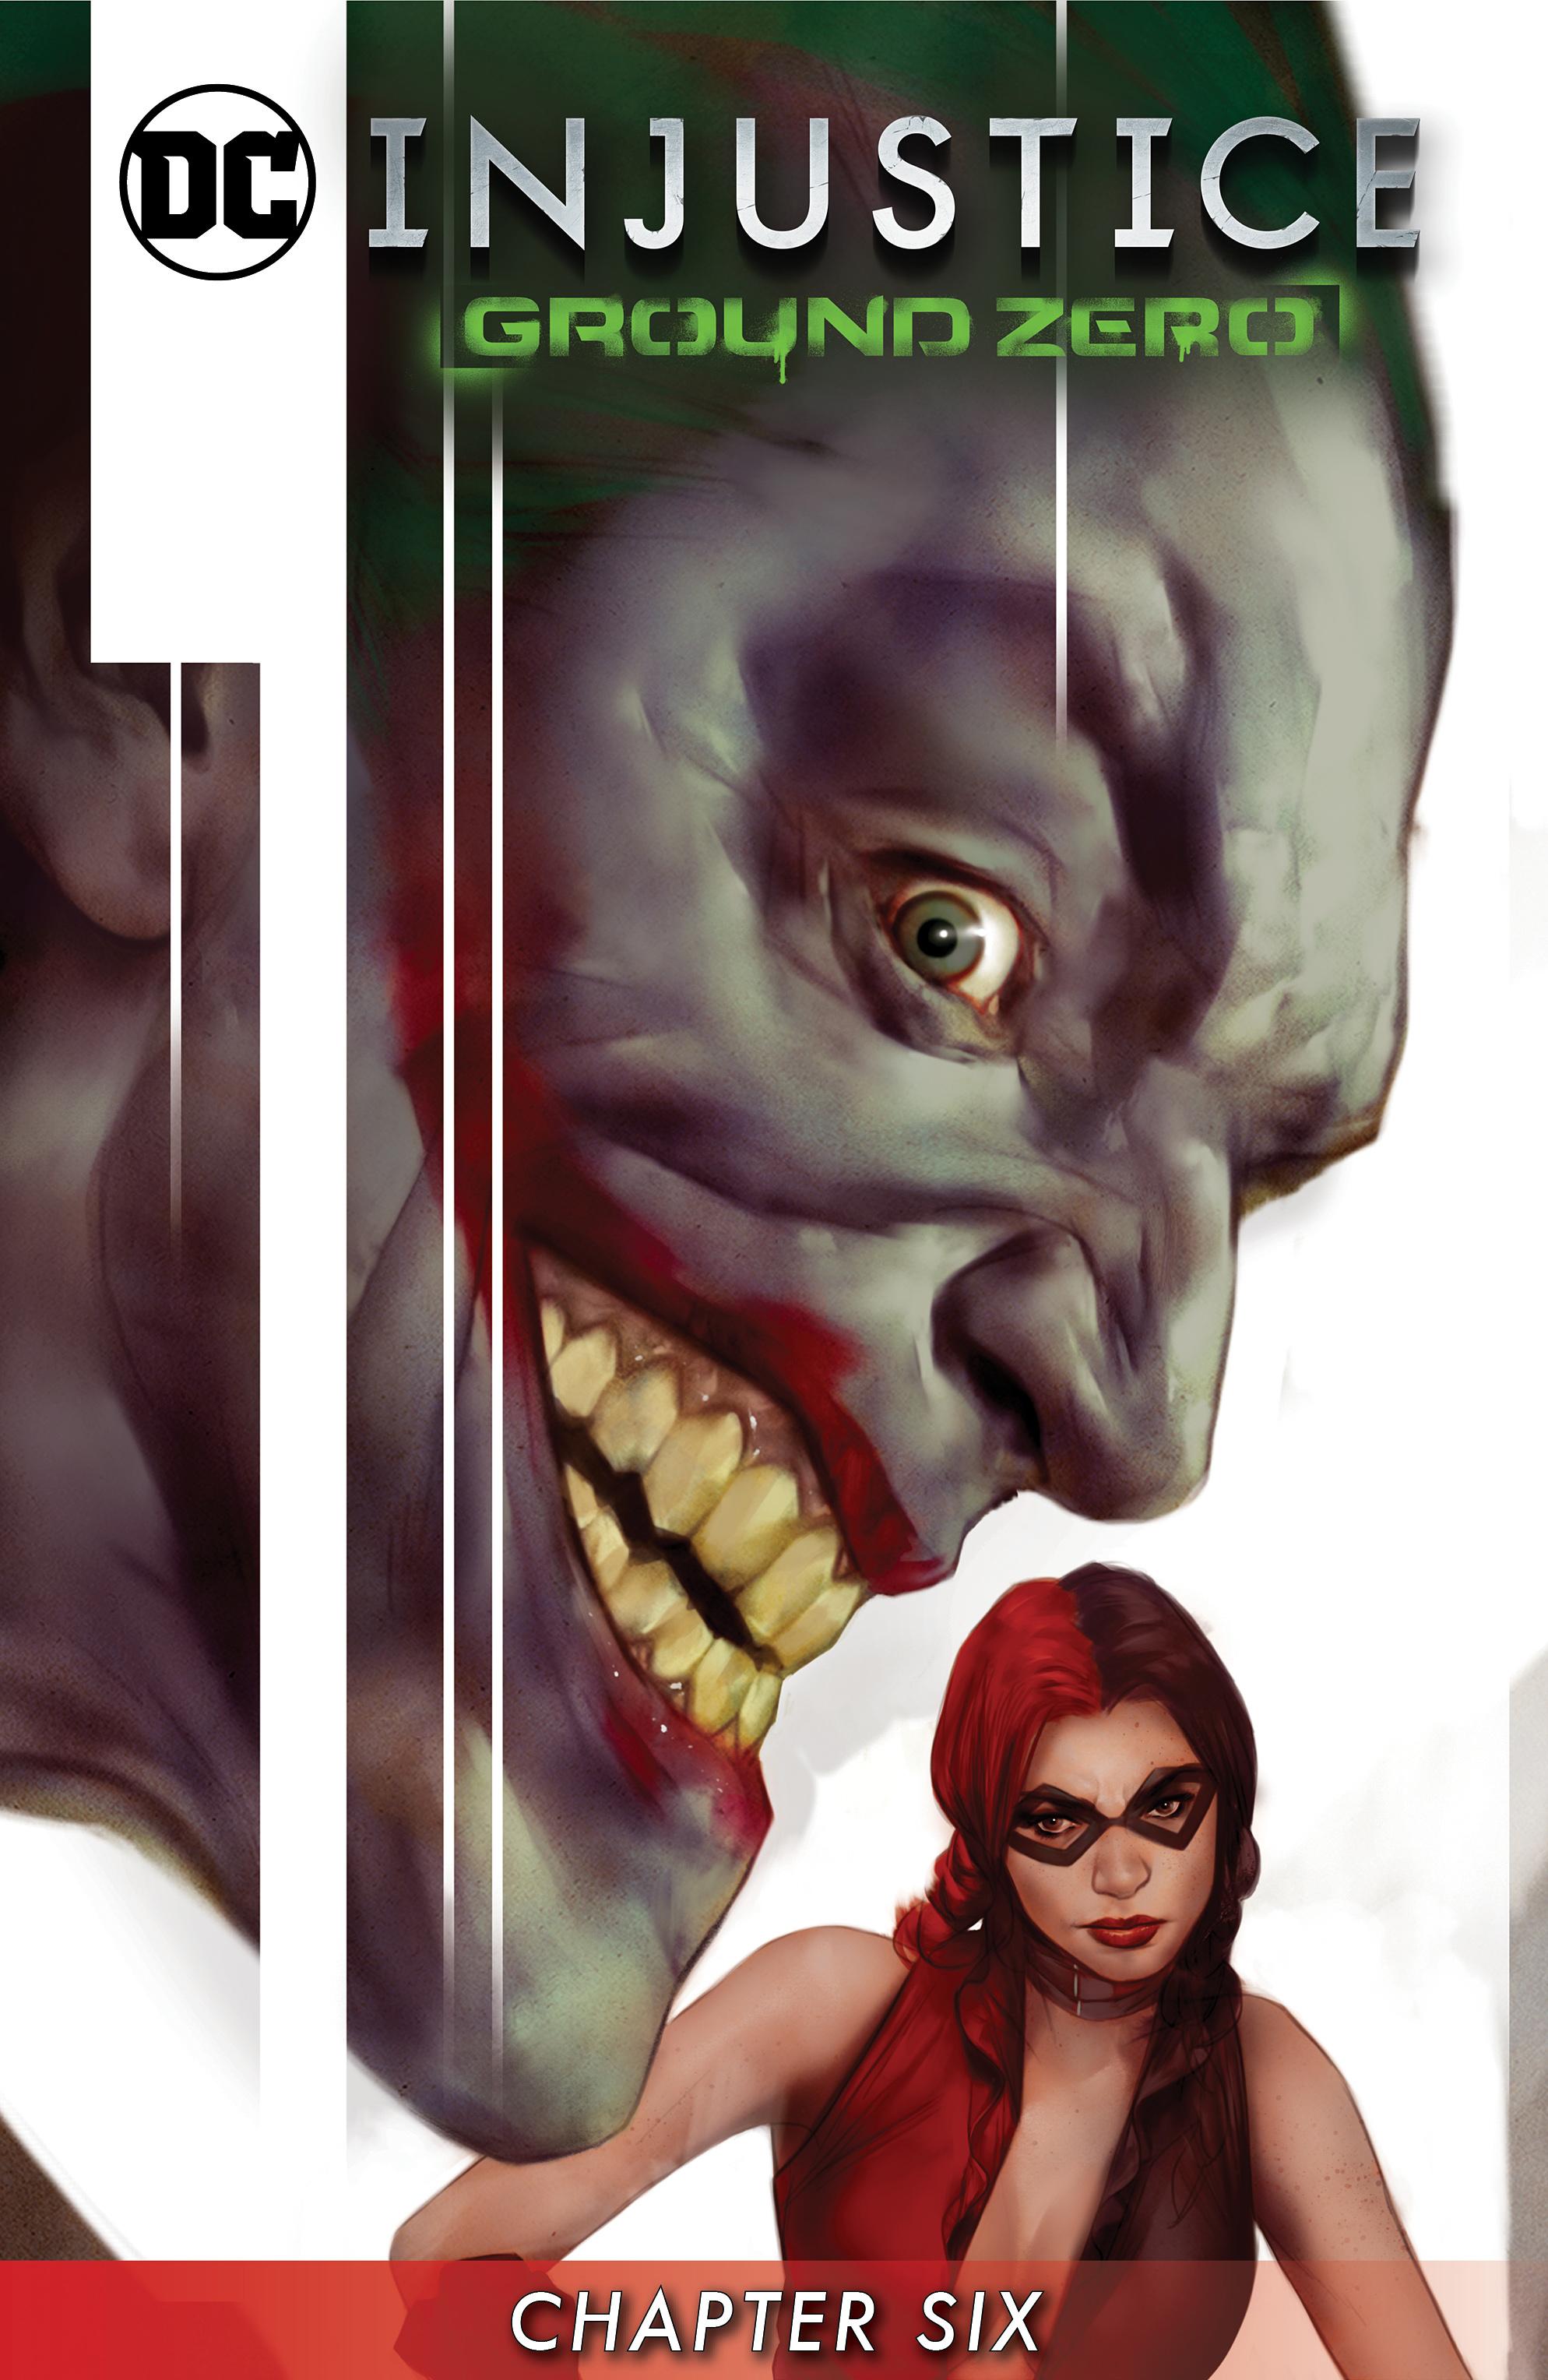 Read online Injustice: Ground Zero comic -  Issue #6 - 2